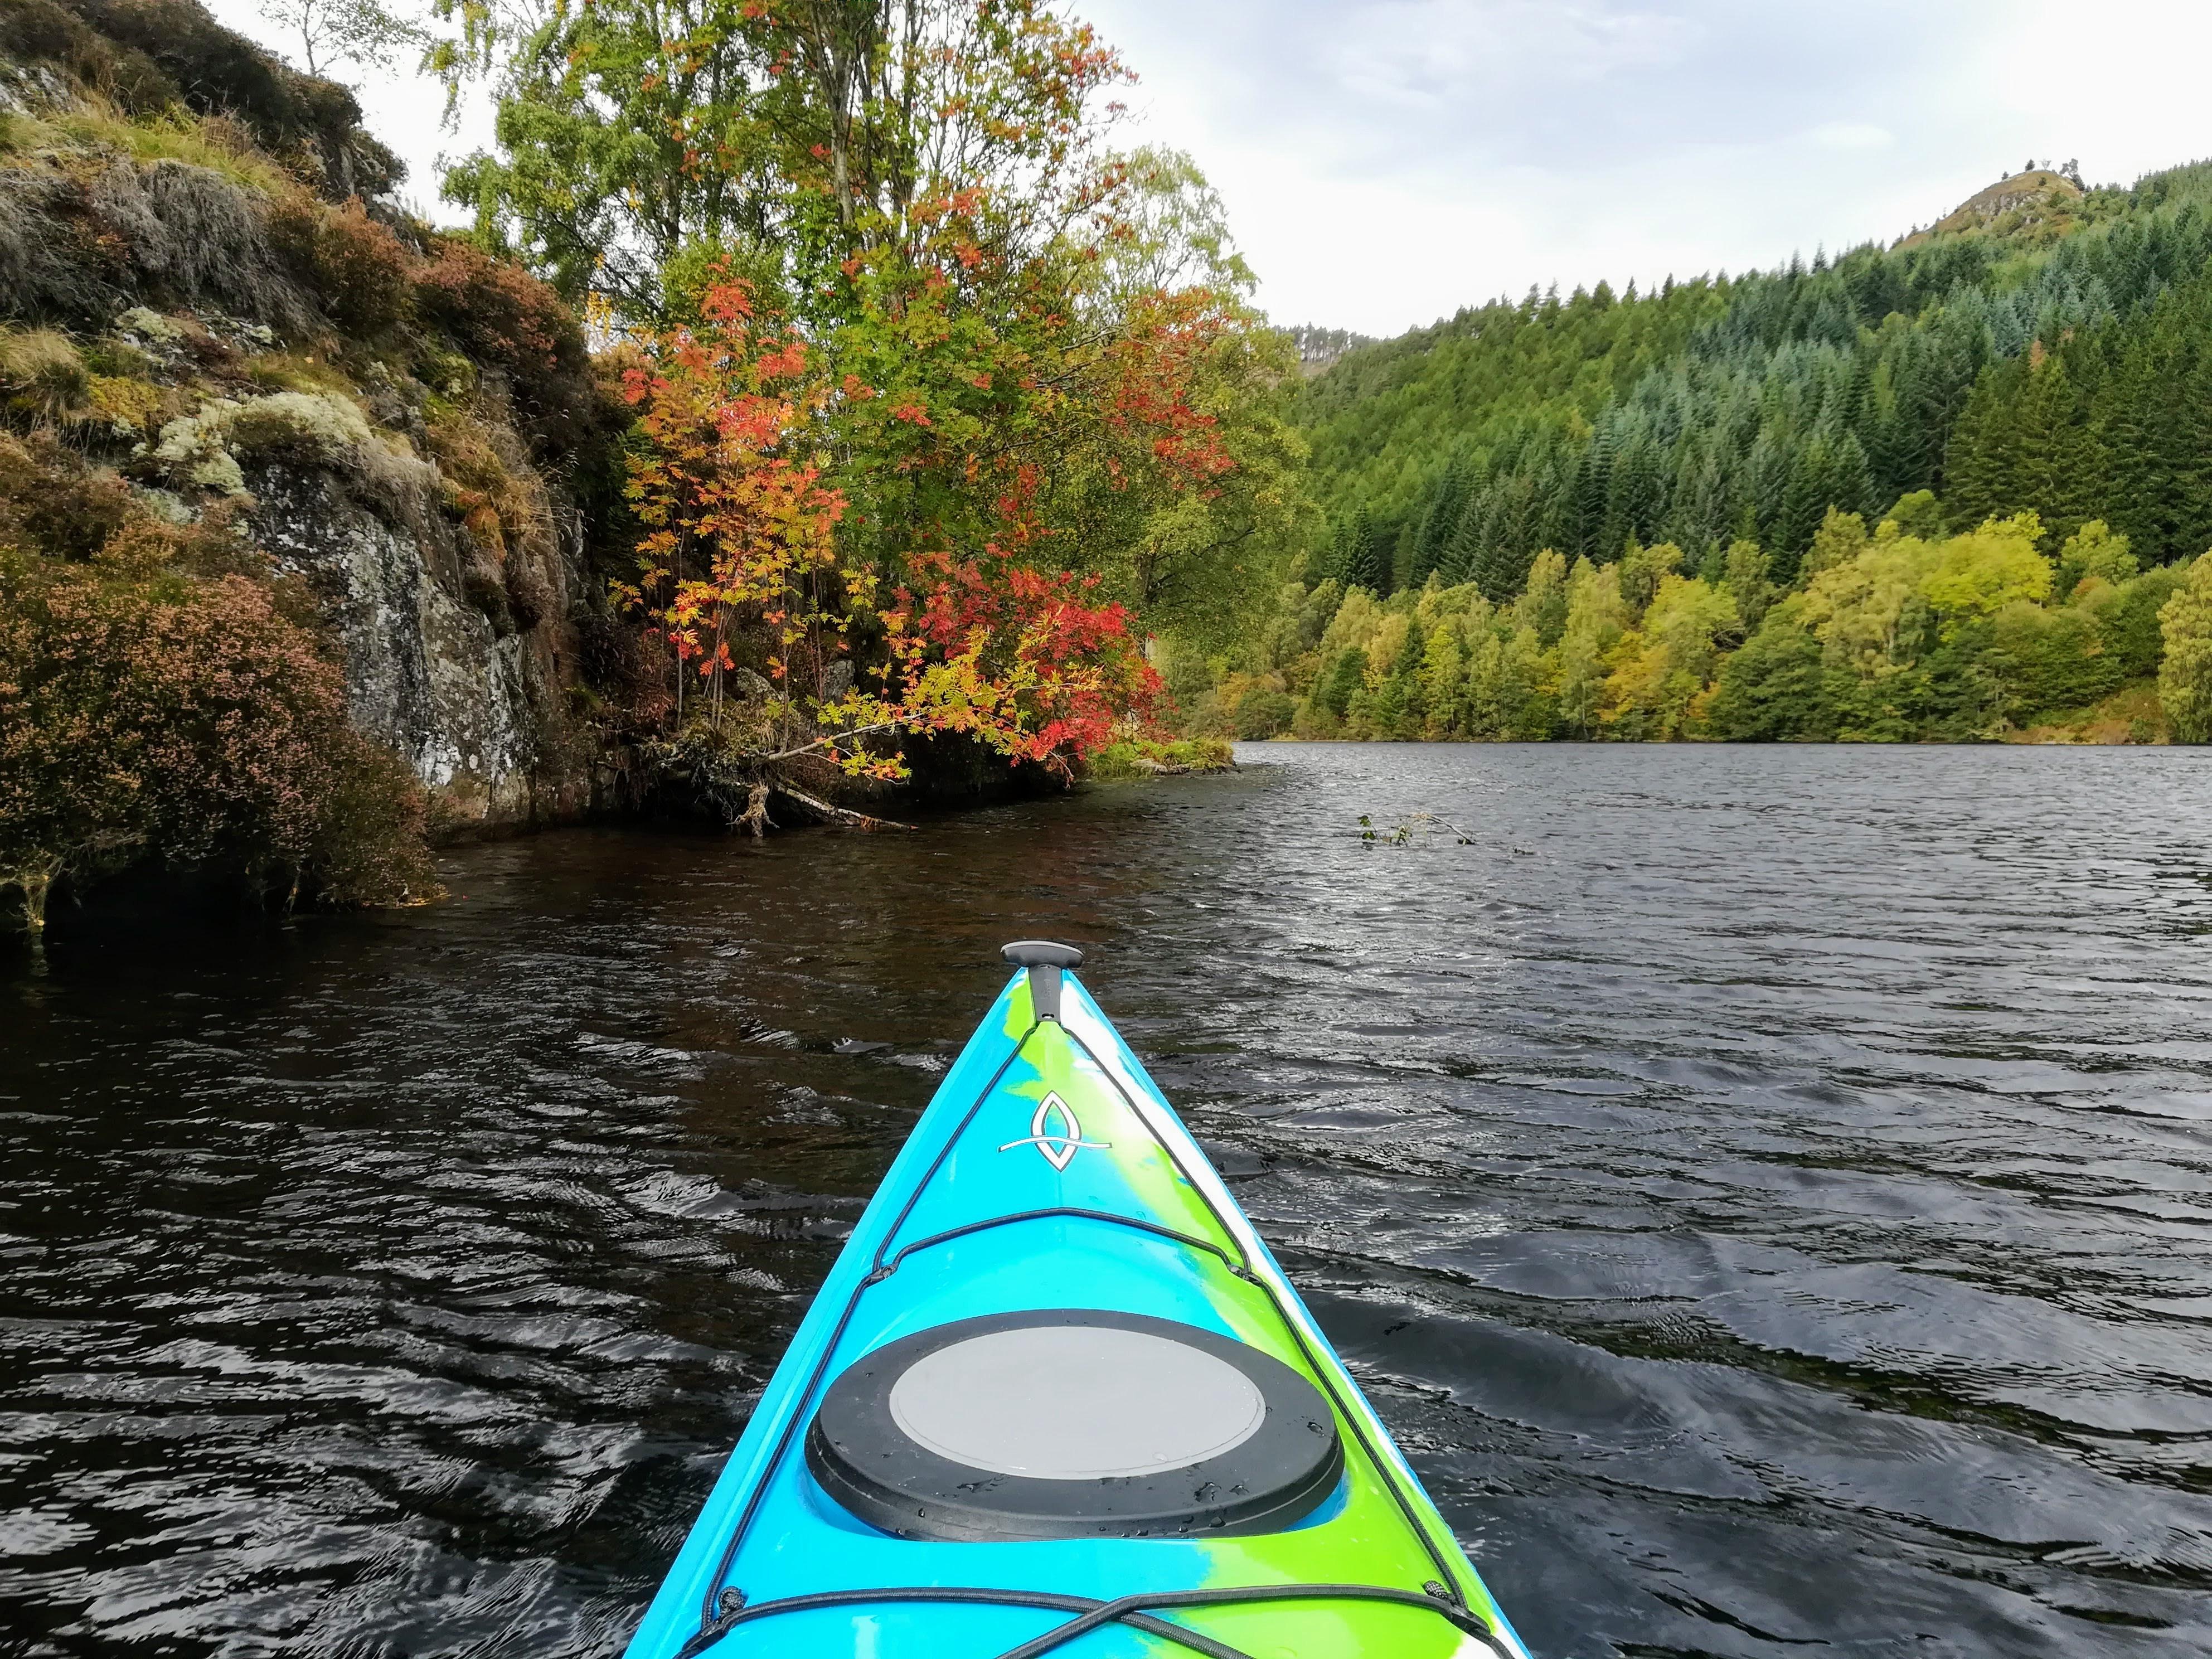 Loch Tummel, kayaking near Pitlochry